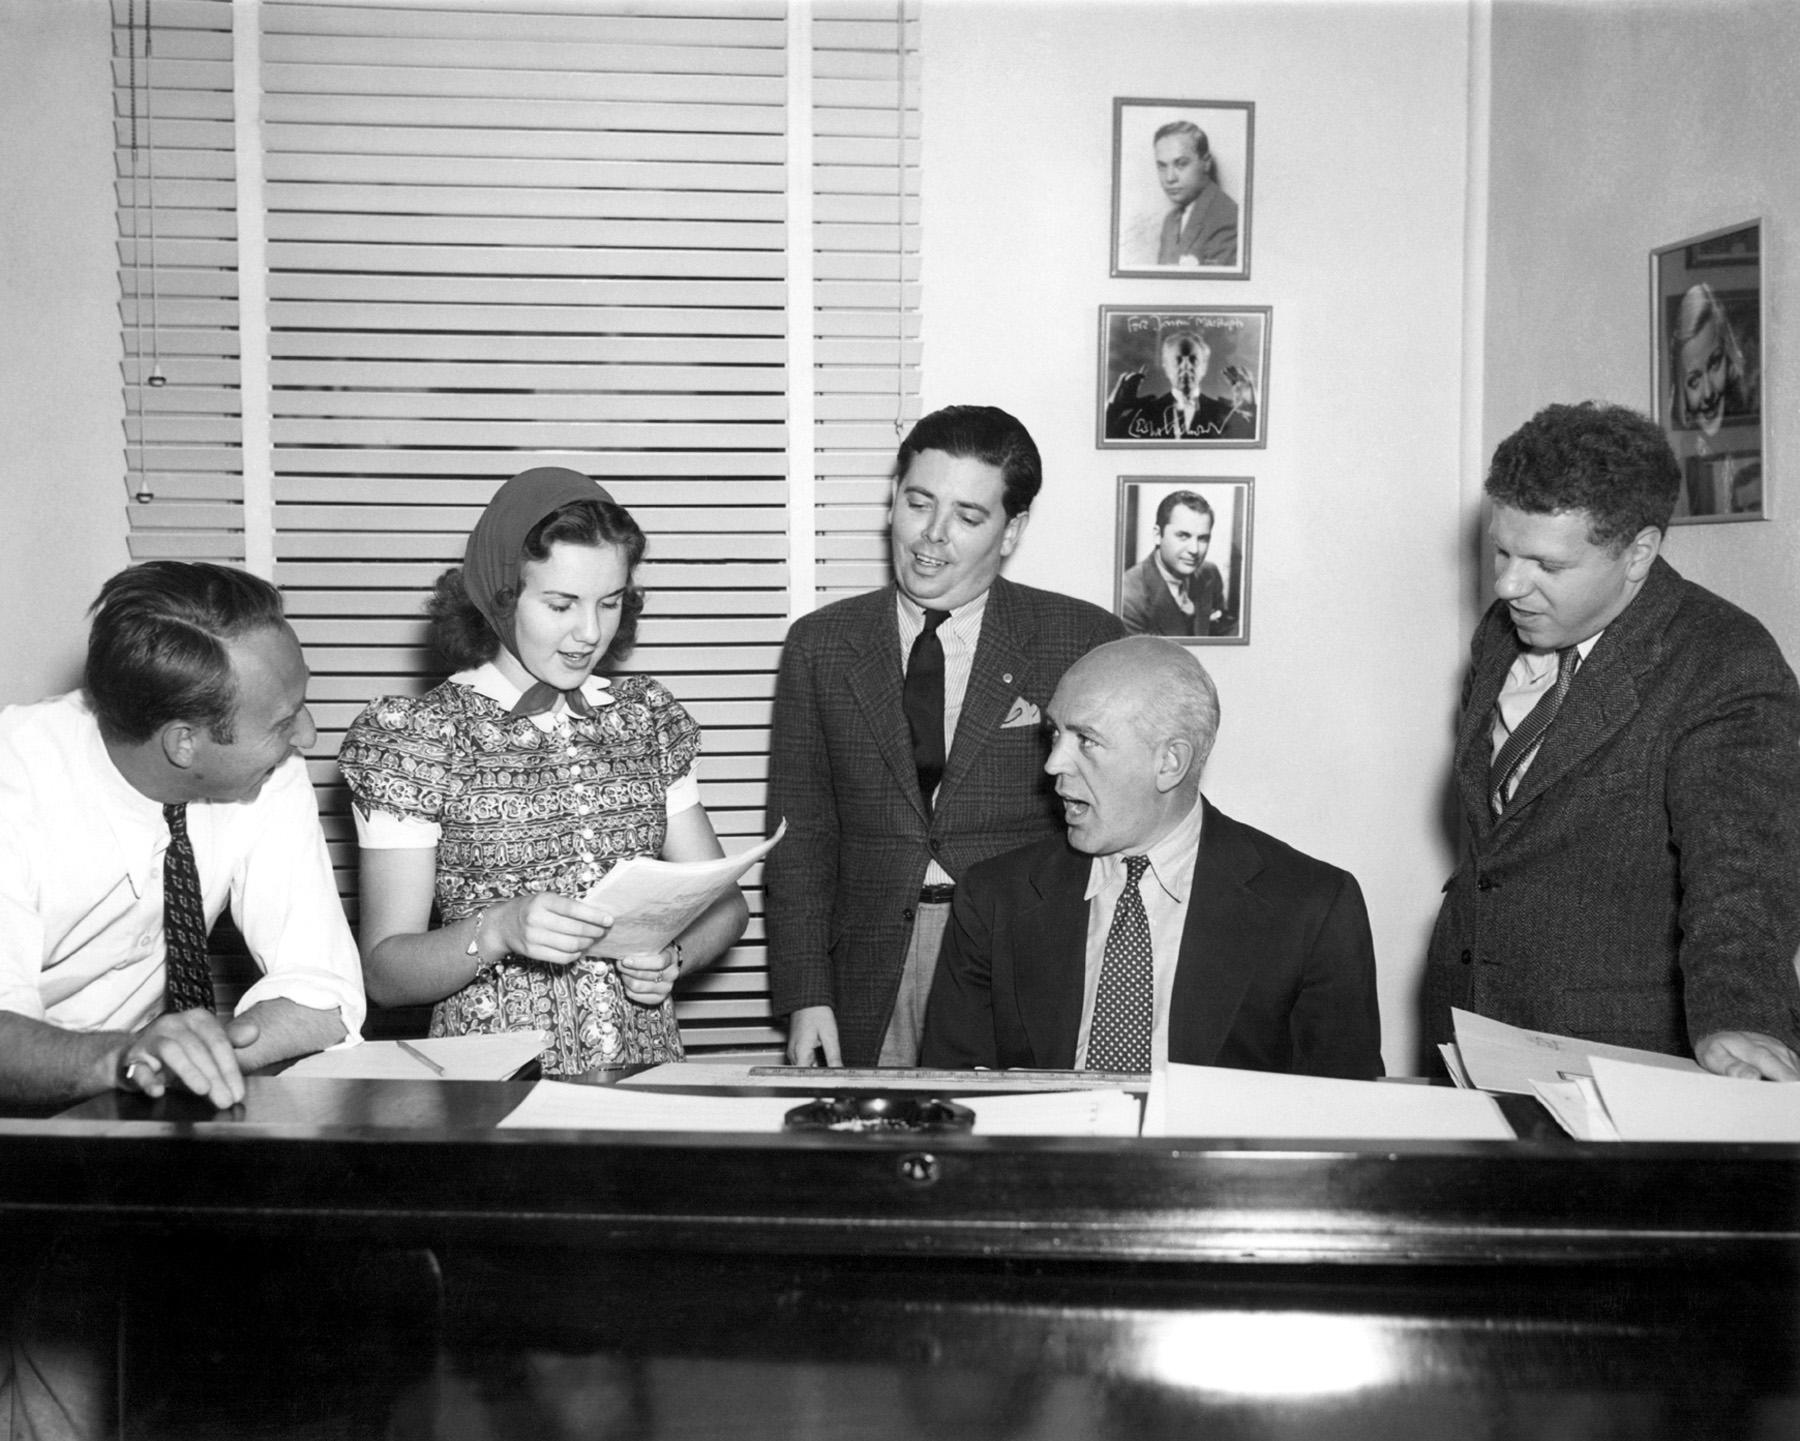 joe Pasternak, Deanna Durbin, Harold Adamson, Jimmy McHugh, Charles Henderson